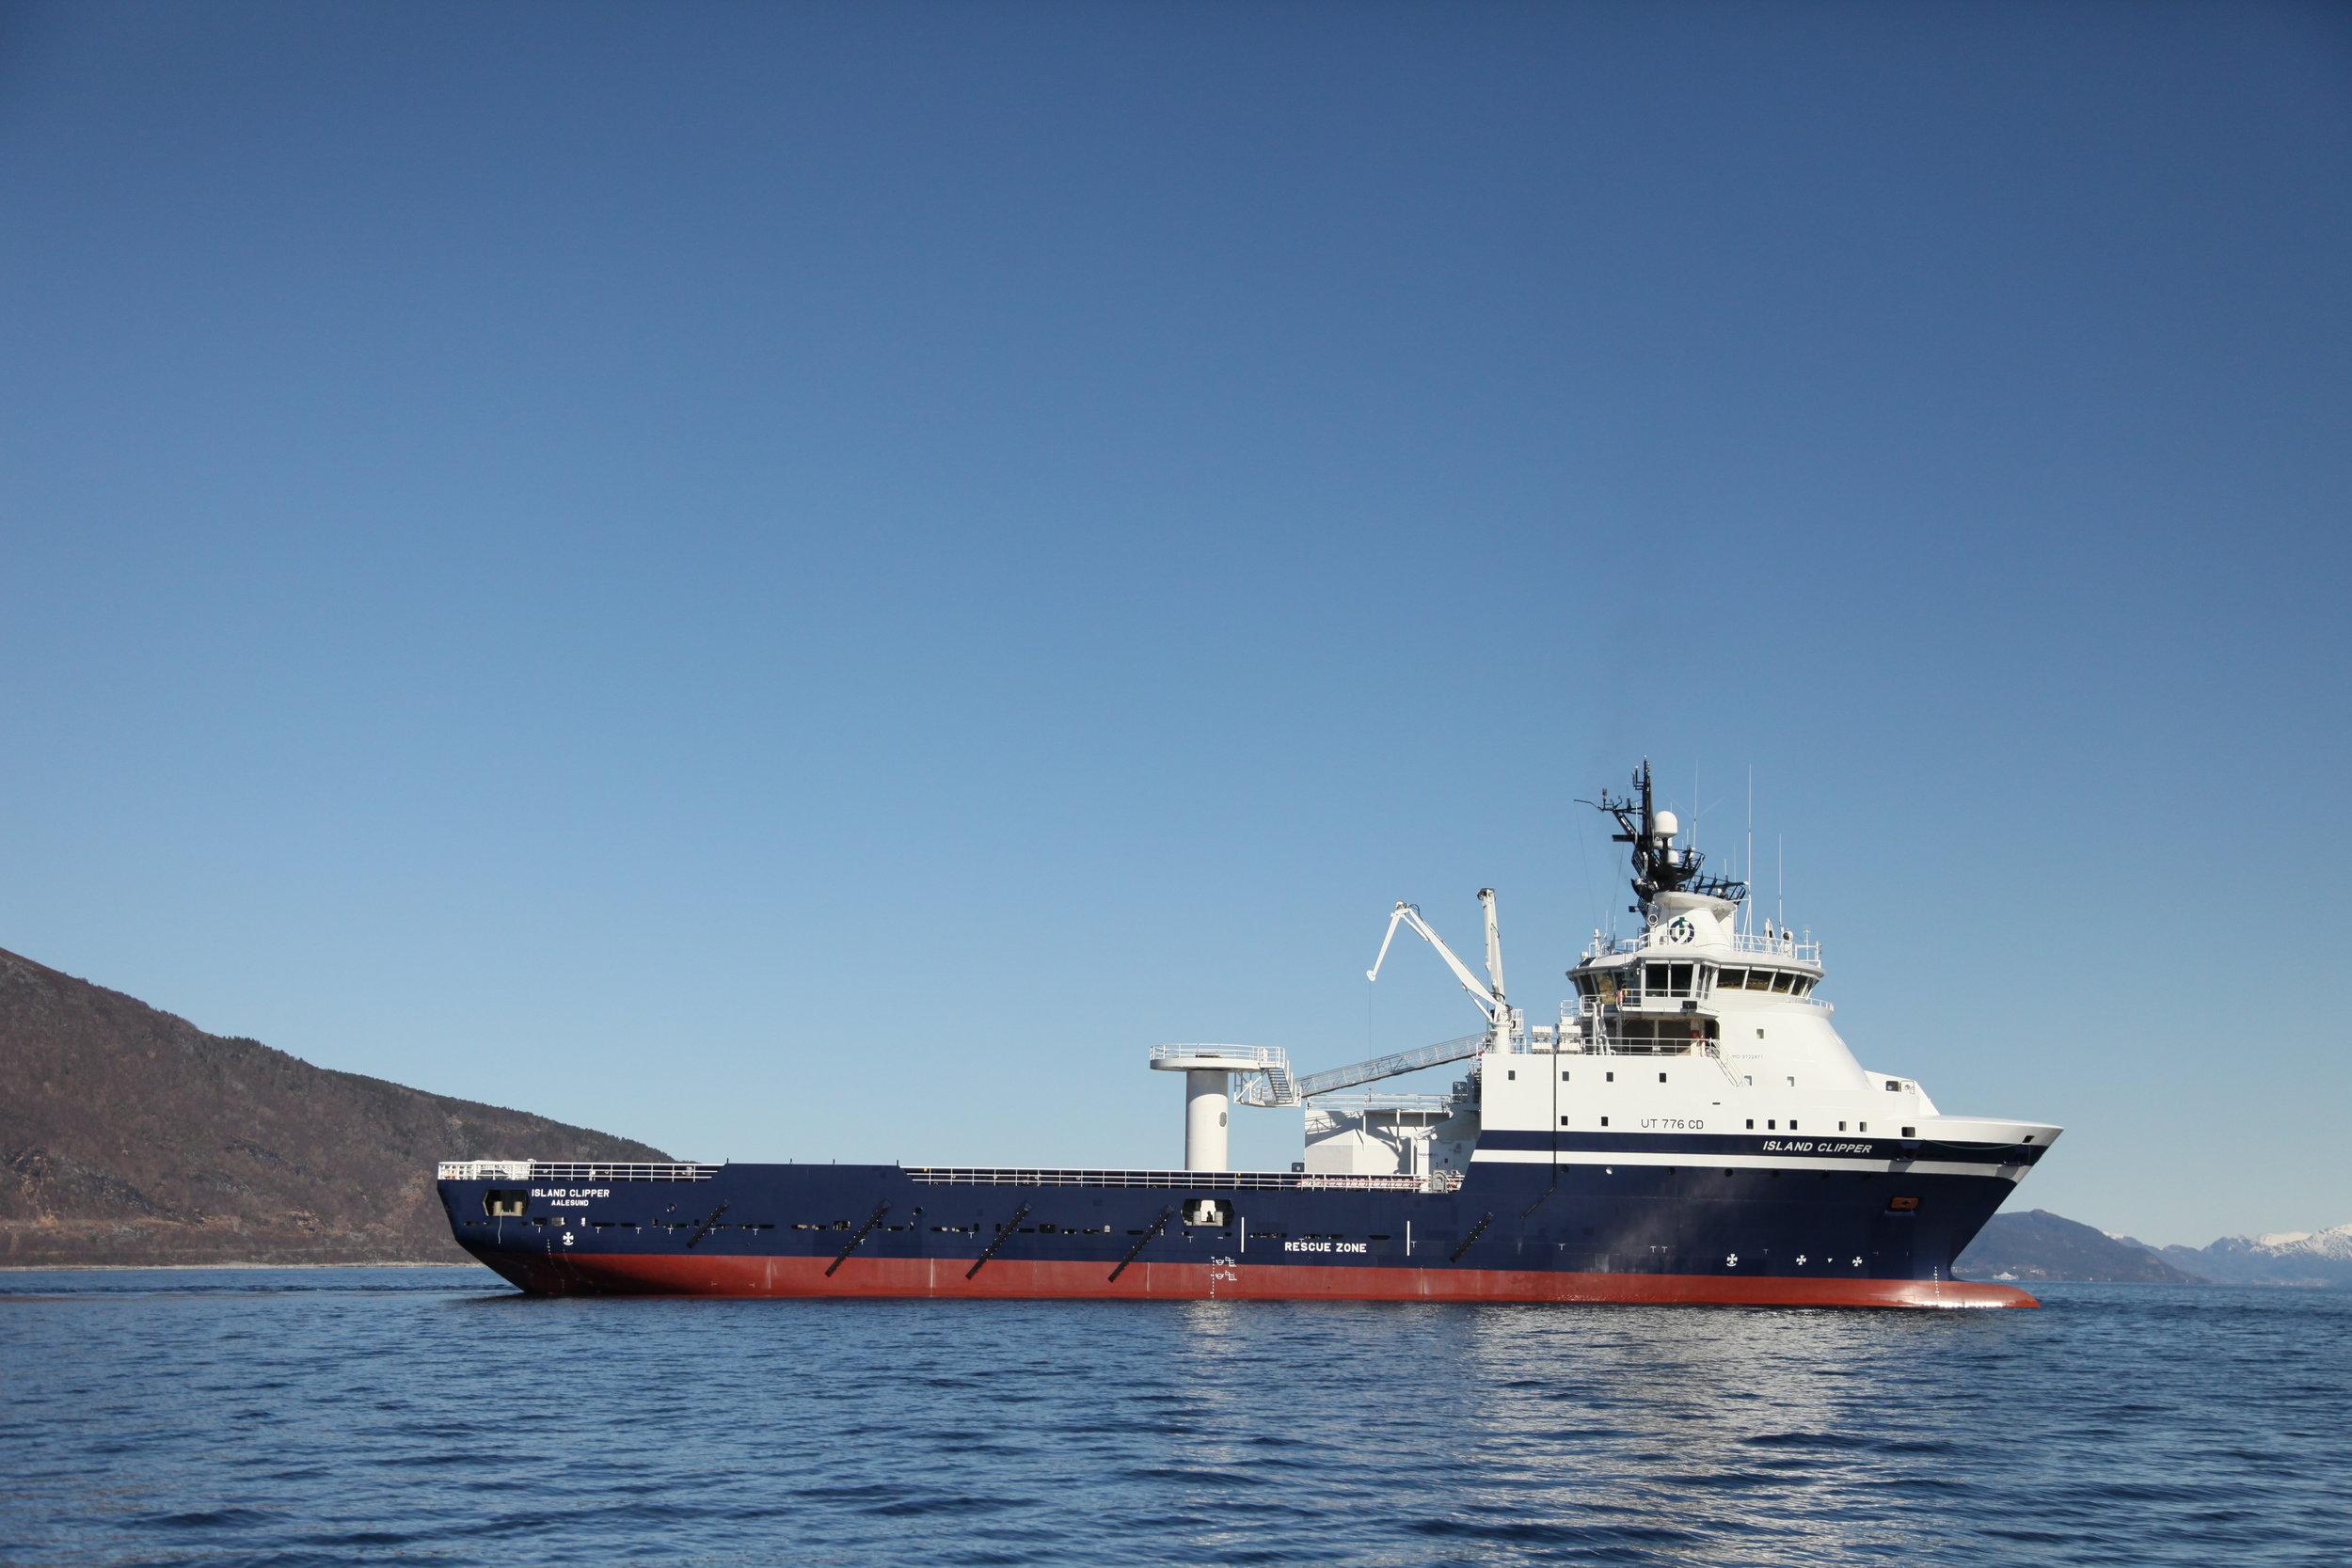 Island Clipper - Energy Storage System